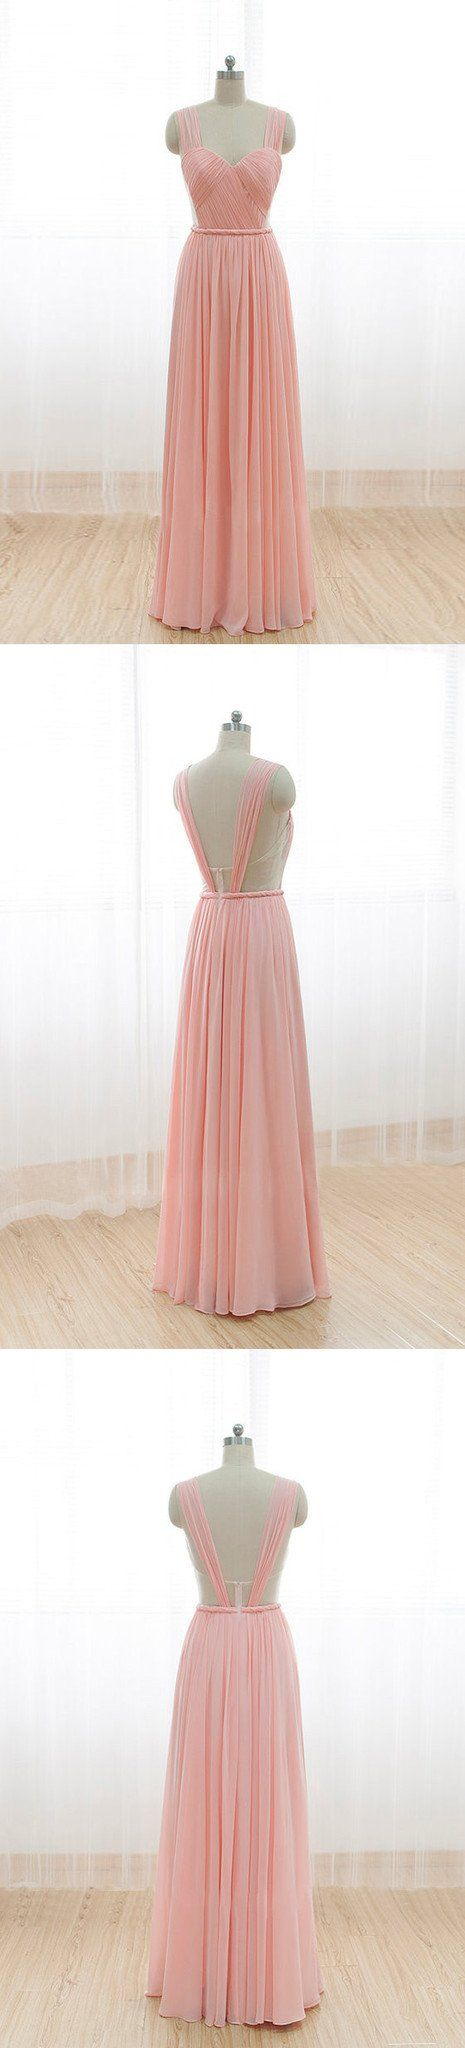 101 mejores imágenes de Bridesmaid Dresses en Pinterest   Damas de ...